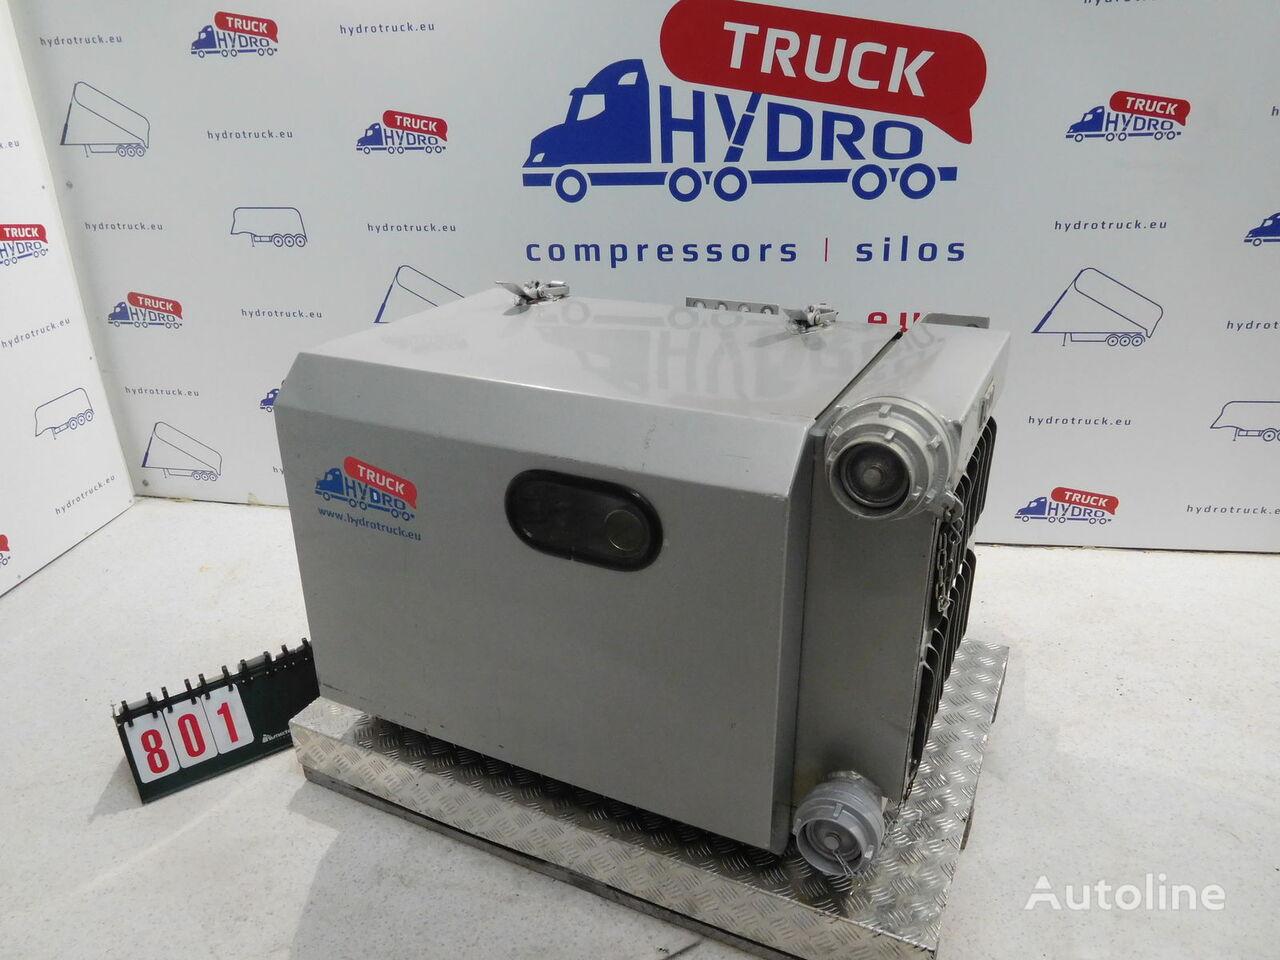 TYPHON 2C MOUVEX BLACKMER W ZABUDOWIE RTI pneumatische compressor voor tankoplegger